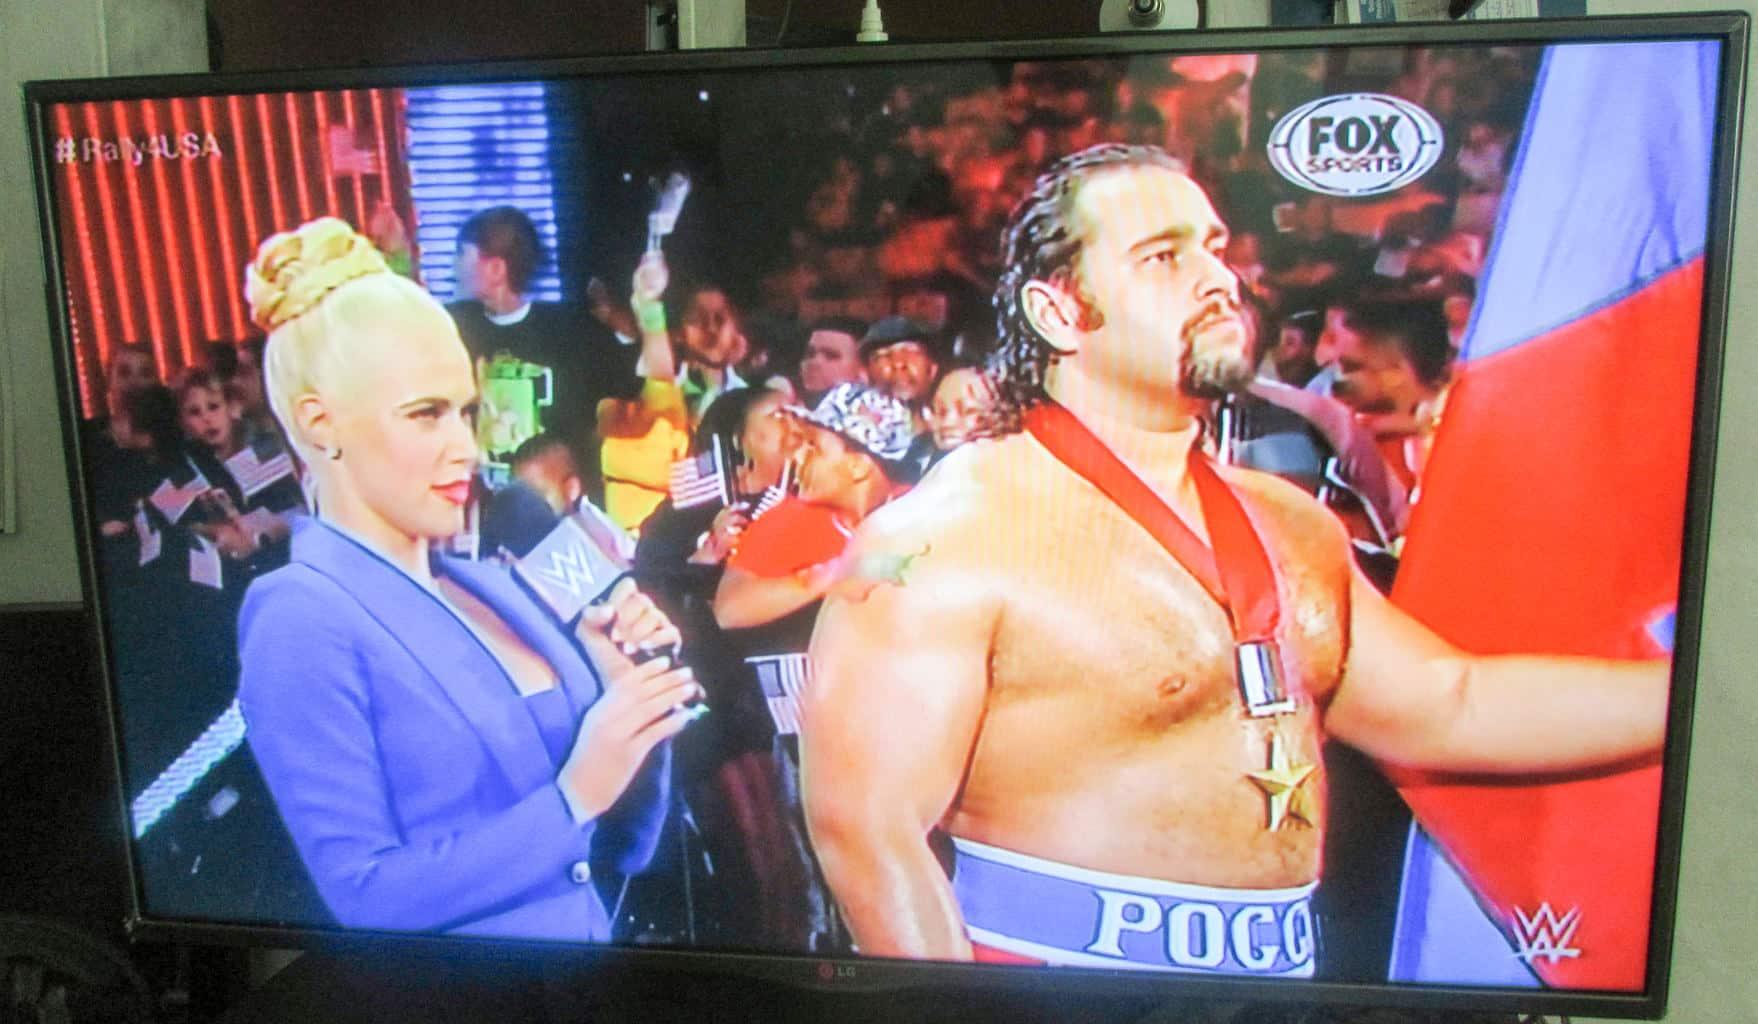 La bella Lana y Rusev en WWE en Fox Sports Latinoamérica (04/10/2014)